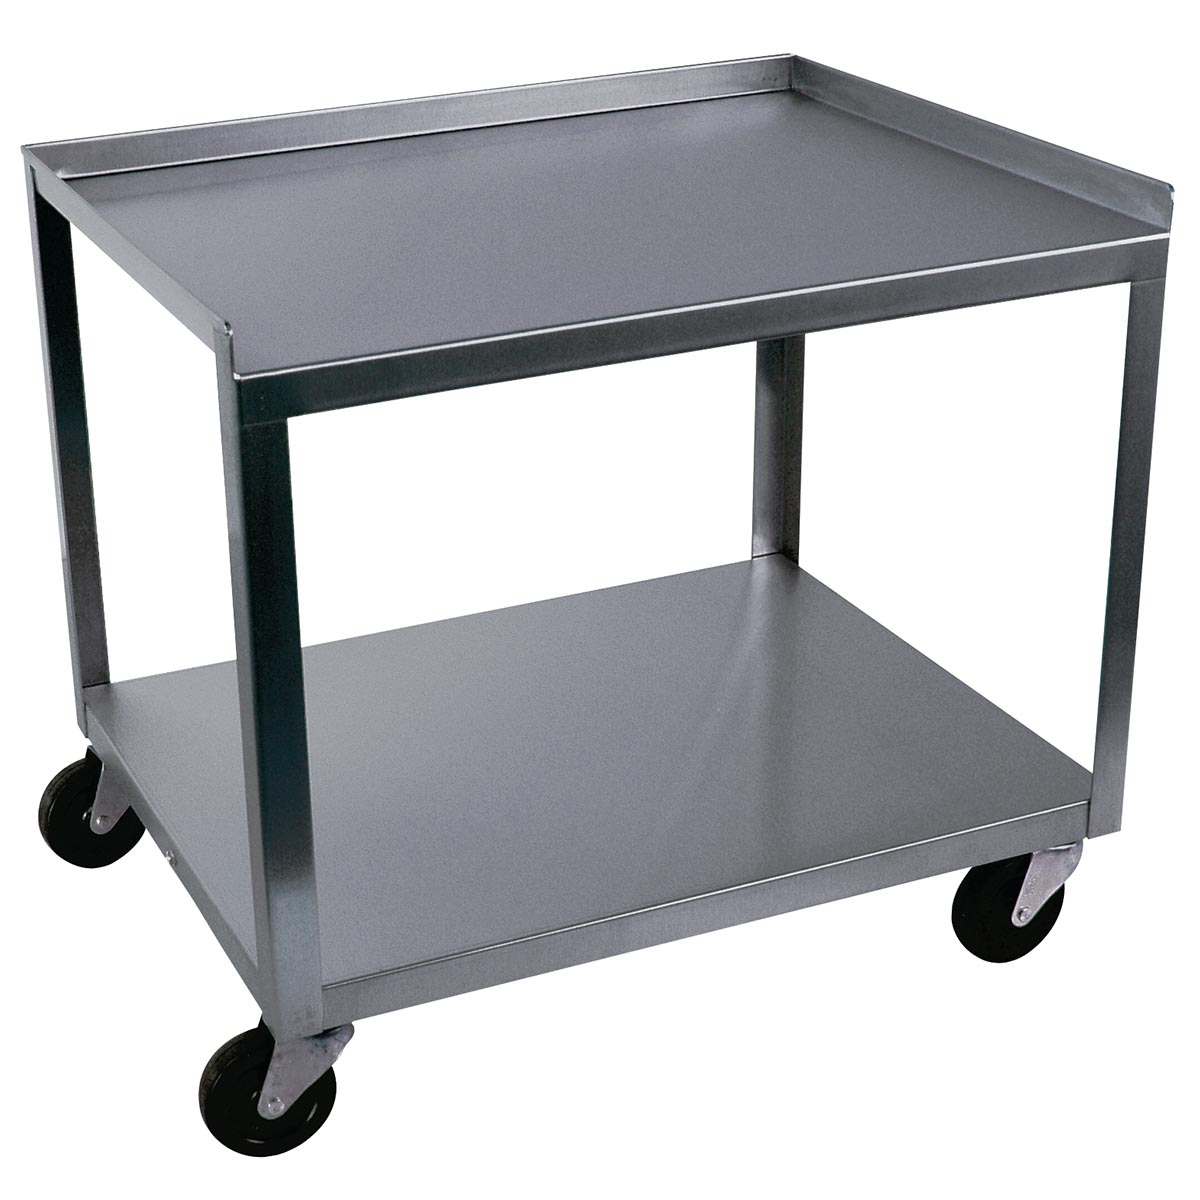 2 Shelf Stainless Steel Cart - W56107 - Ideal - MC221 ...